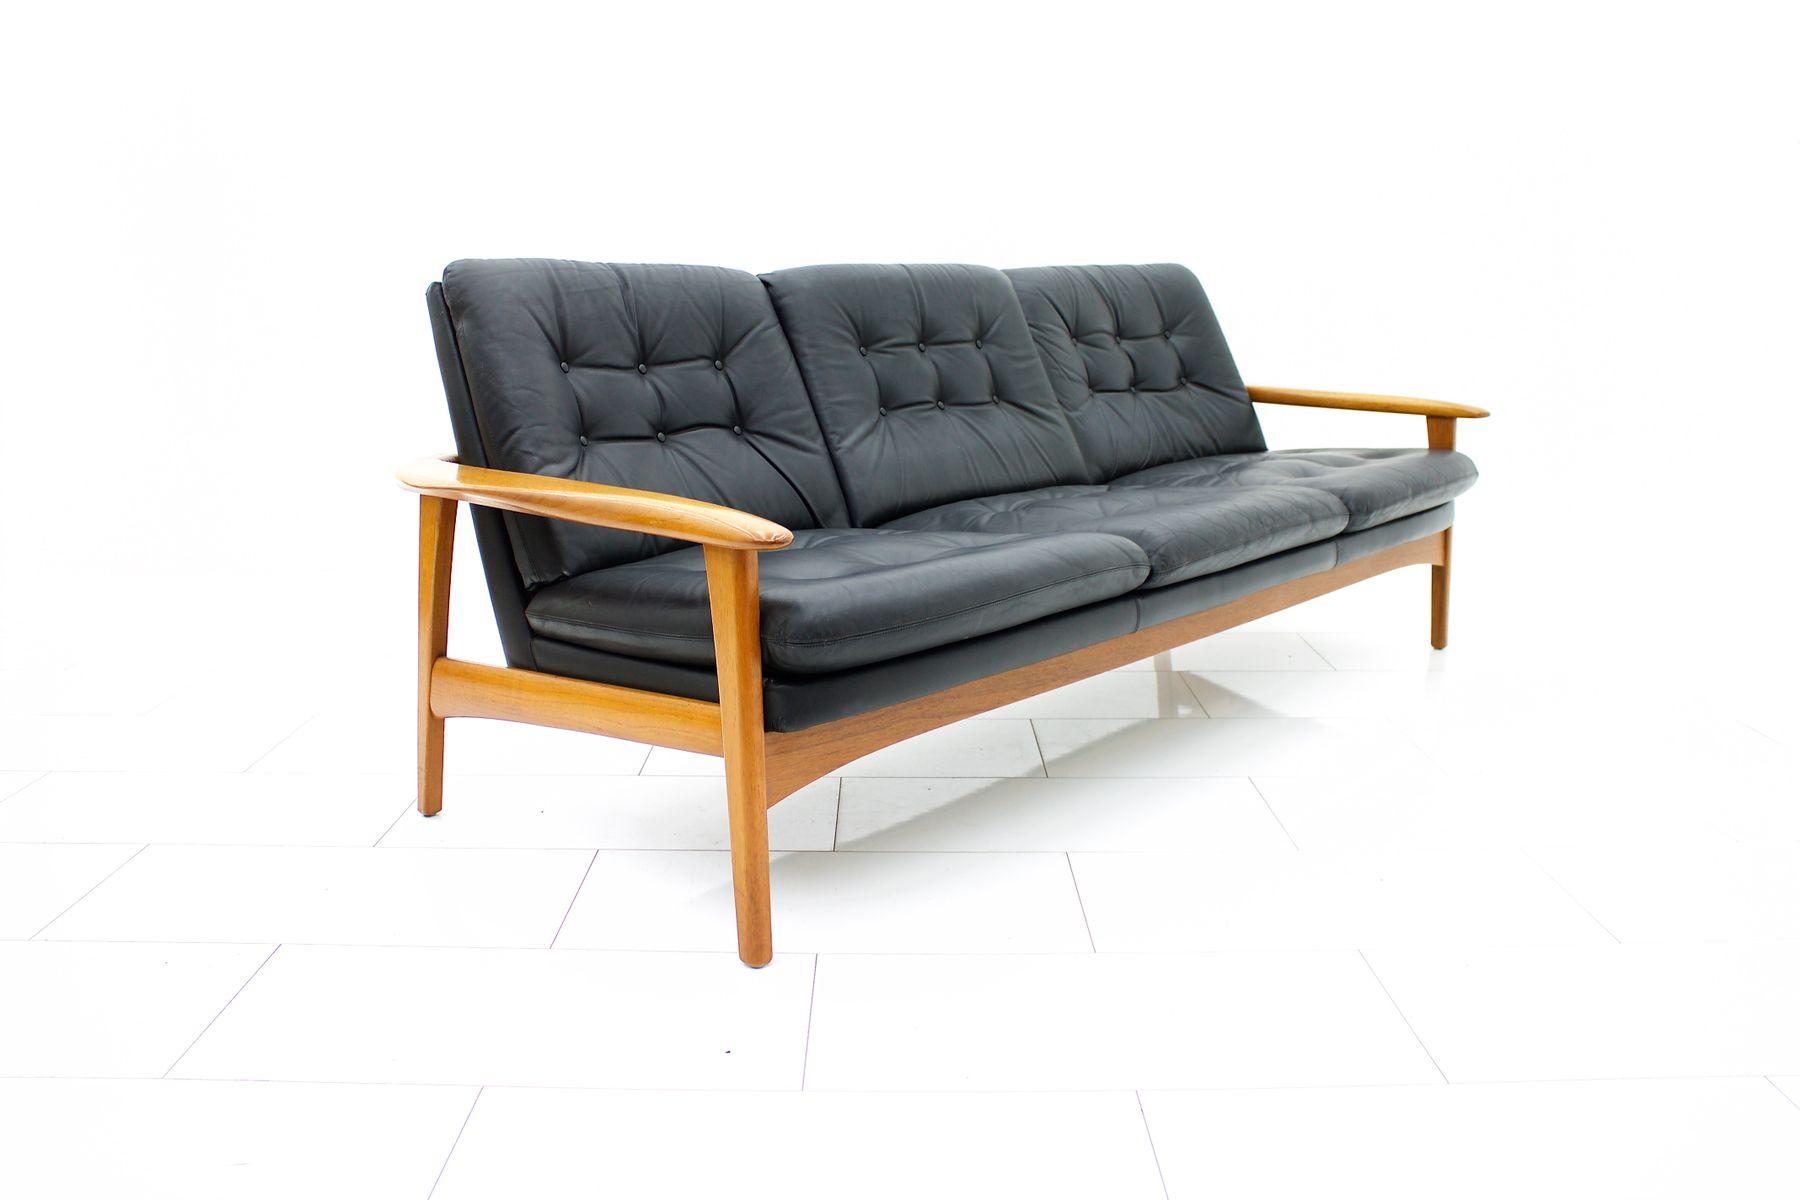 Danish Modern Teak and Leather Sofa 1960s for sale at Pamono